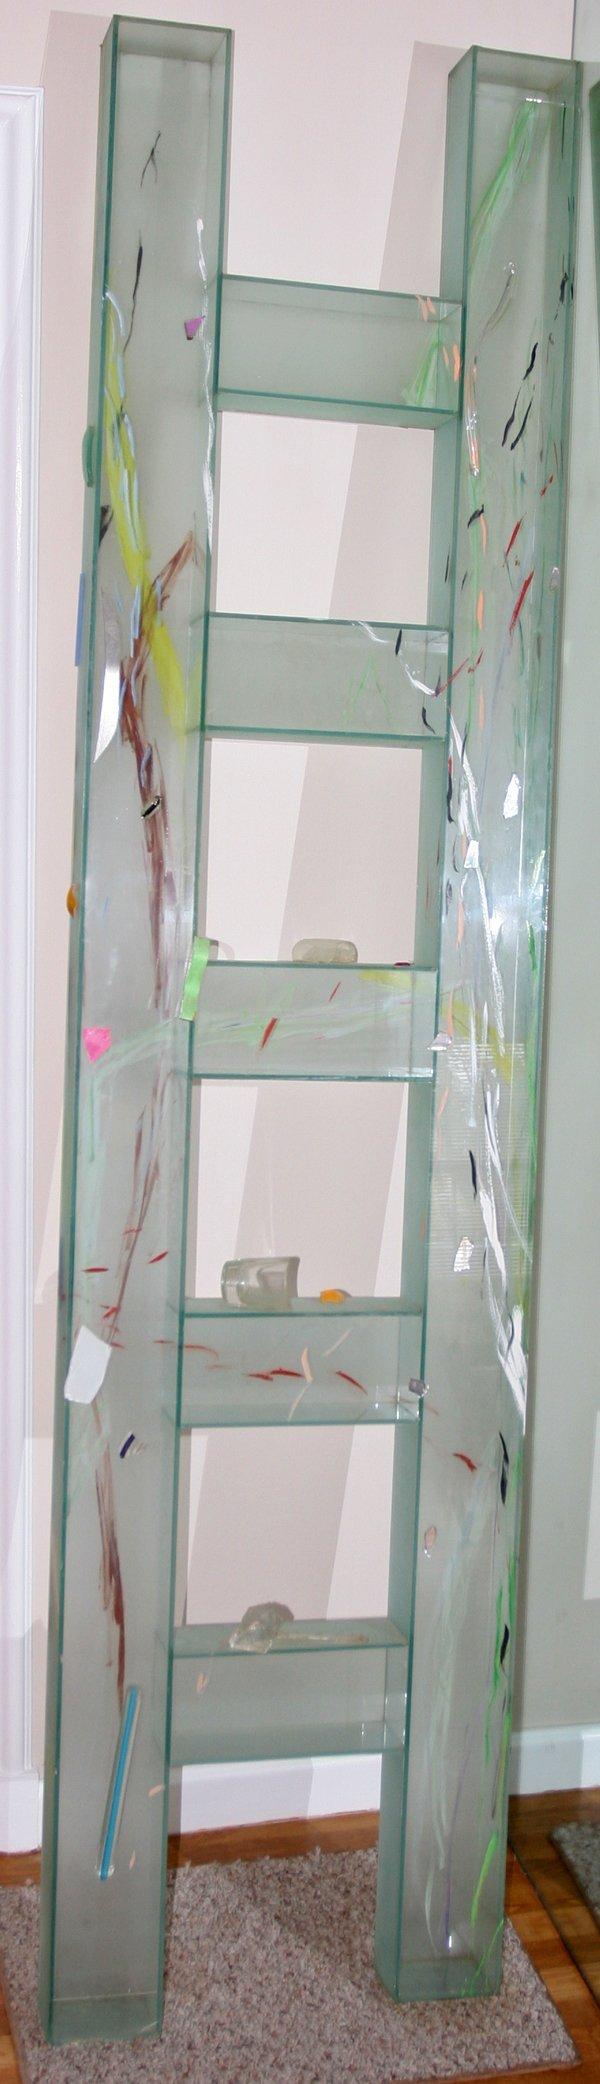 081012: THERMAN STATOM GLASS LADDER-FORM SCULPTURE,